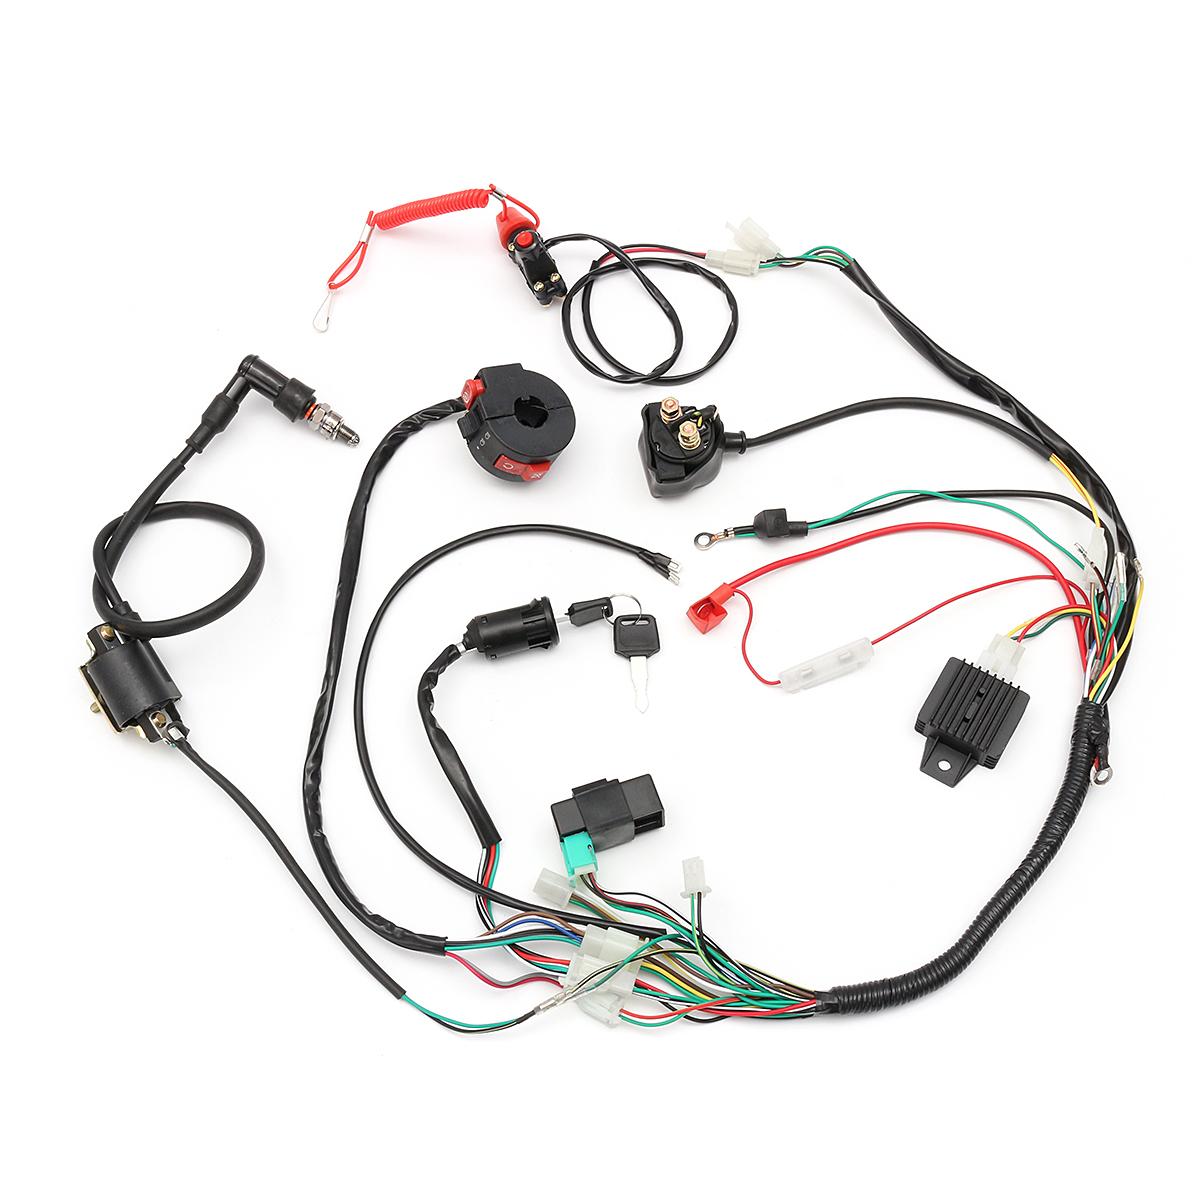 hight resolution of kazuma meerkat wiring diagram kazuma meerkat engine wiring